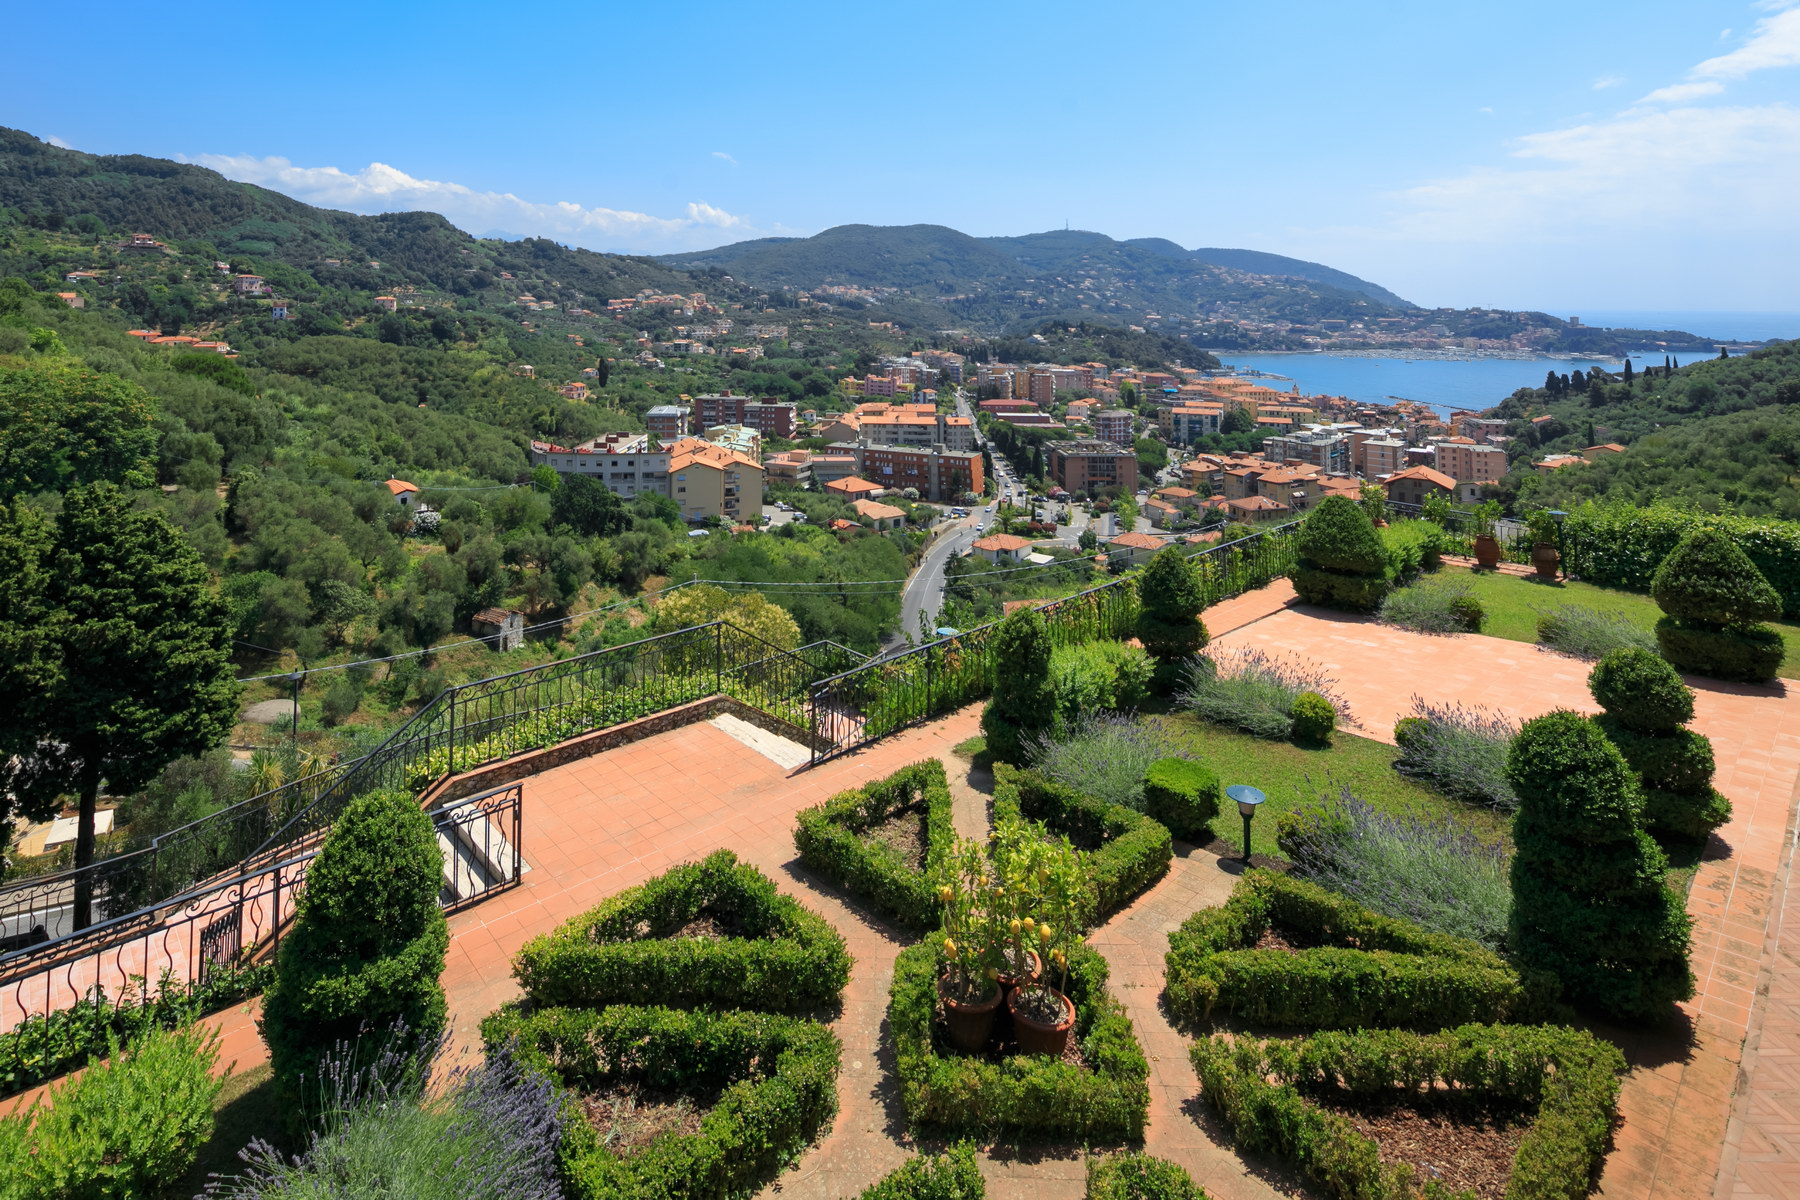 Villa in Vendita a Lerici: 5 locali, 620 mq - Foto 22